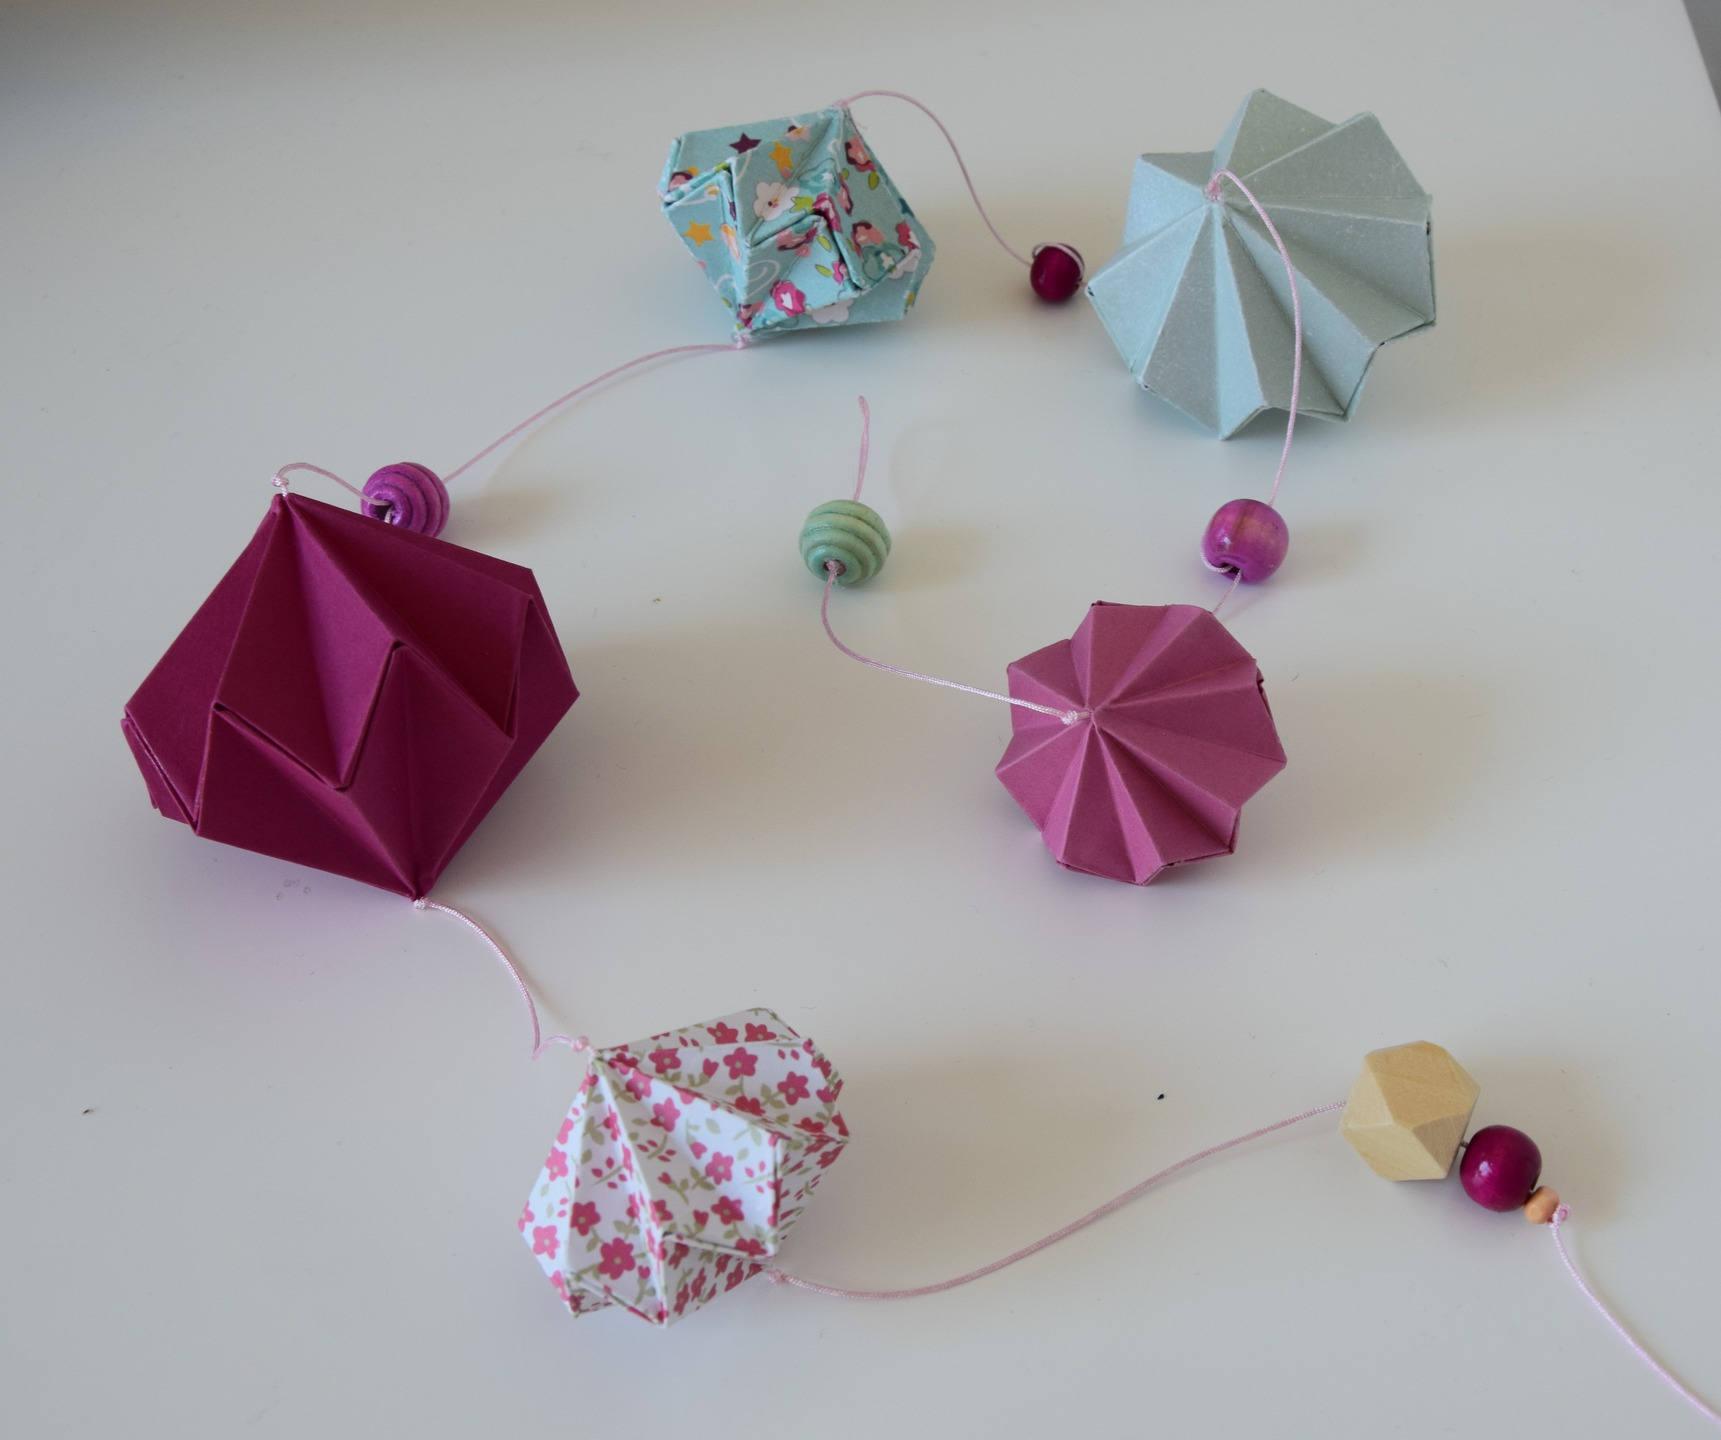 Guirlande origami diamant d coration murale fille - Origami decoration murale ...